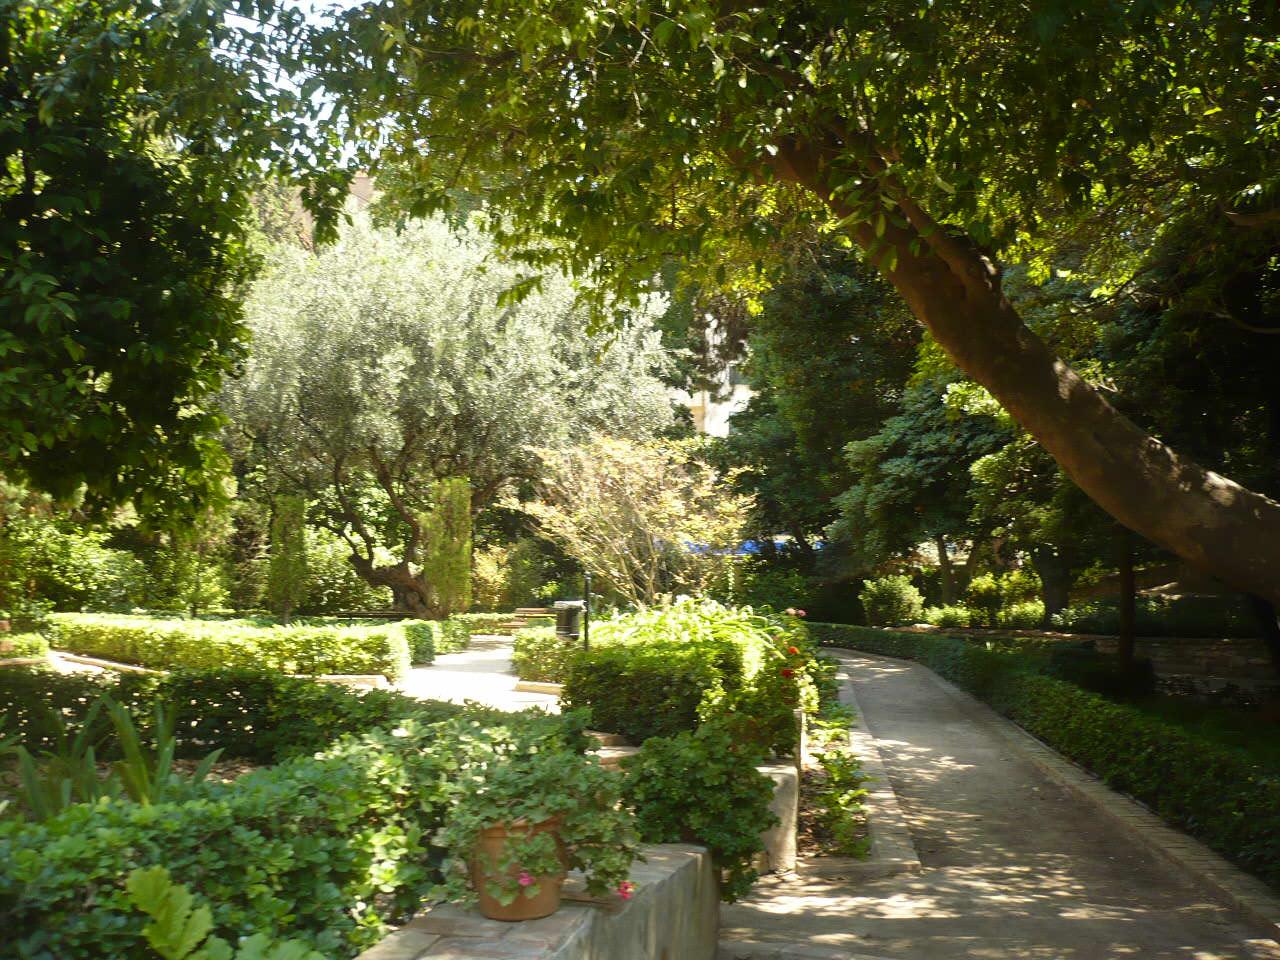 Jardines de monforte lista roja del patrimonio - Fotos de jardines ...